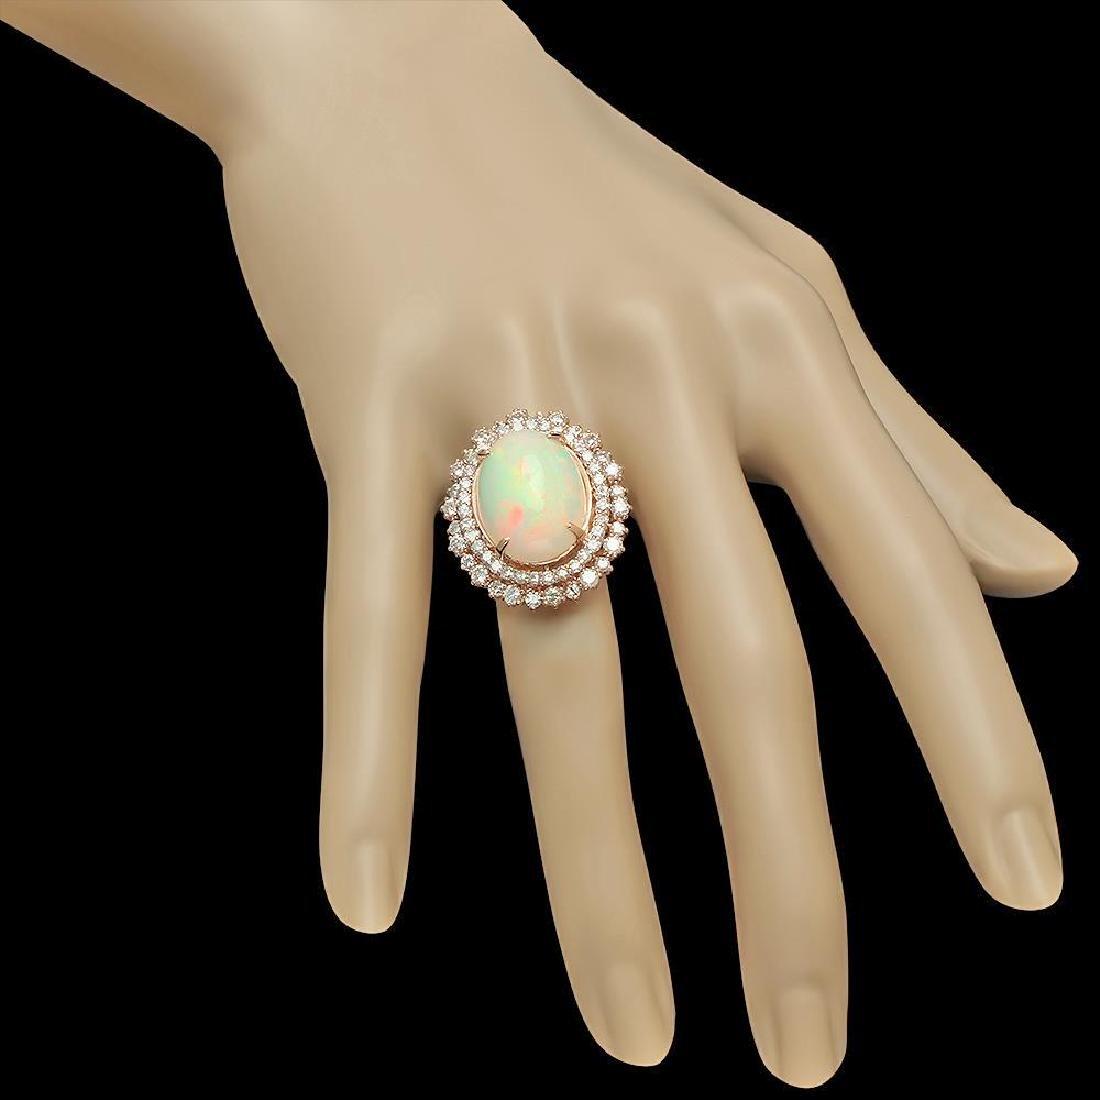 14K Gold 7.38ct Opal & 2.12ct Diamond Ring - 3